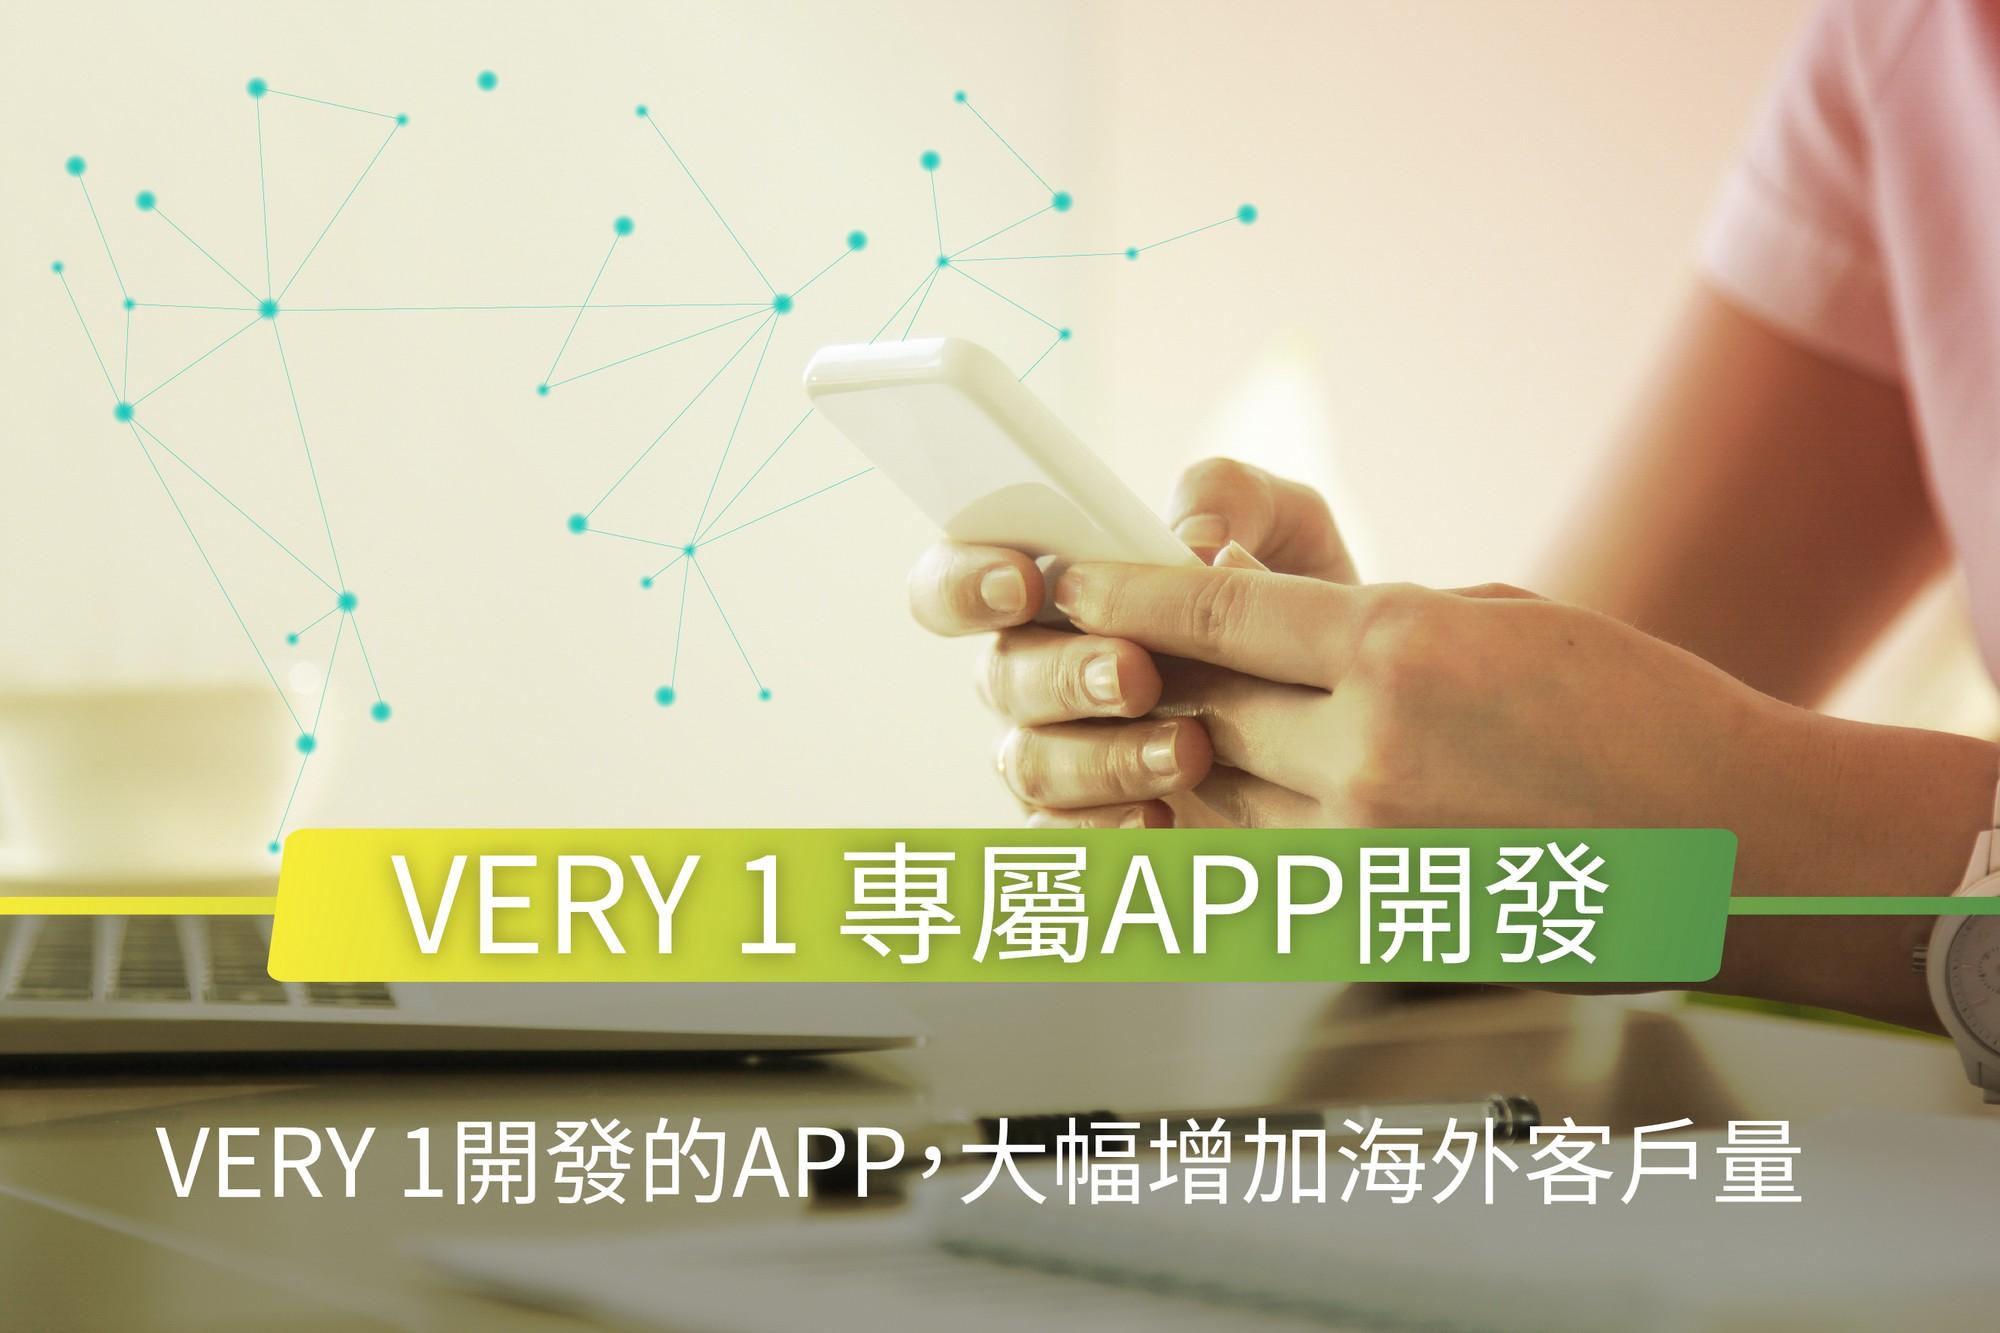 APP開發,APP管理,APP上架,客制化APP,APP訂單預約系統